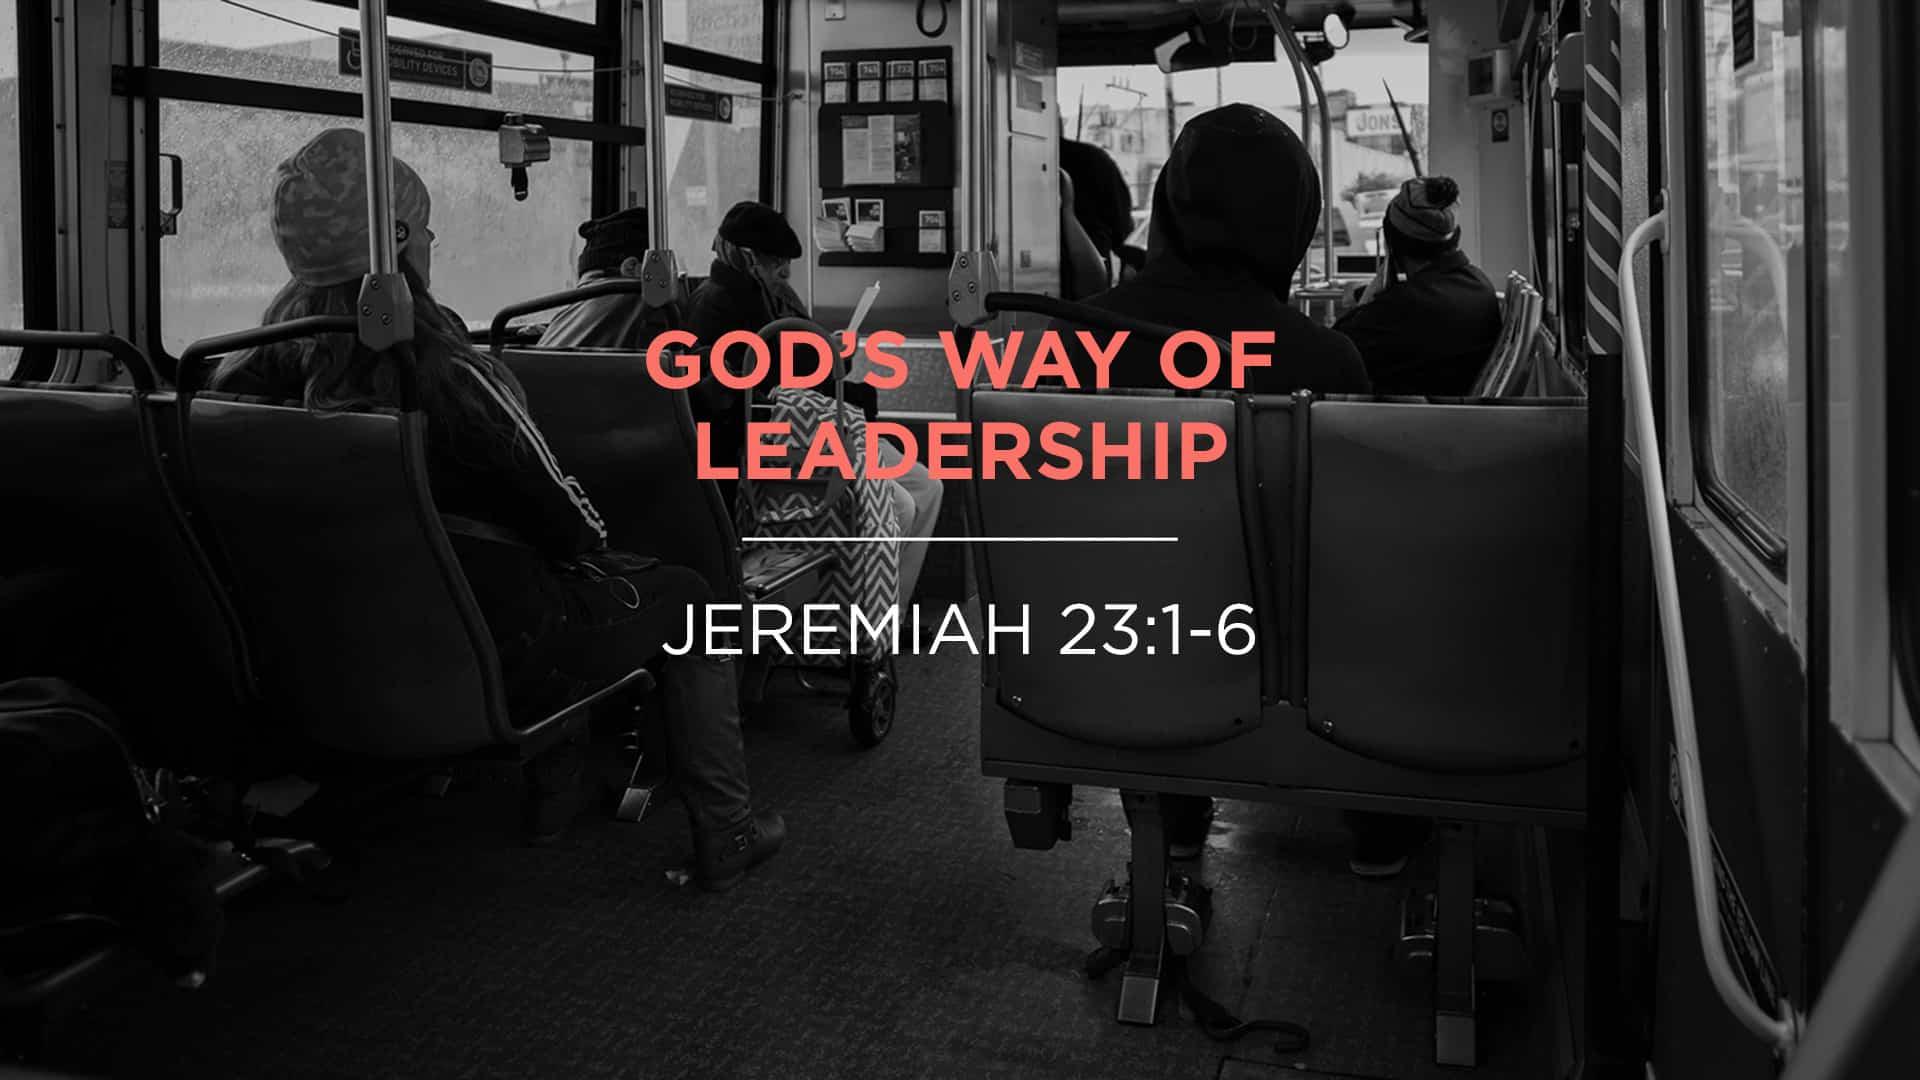 God's Way of Leadership